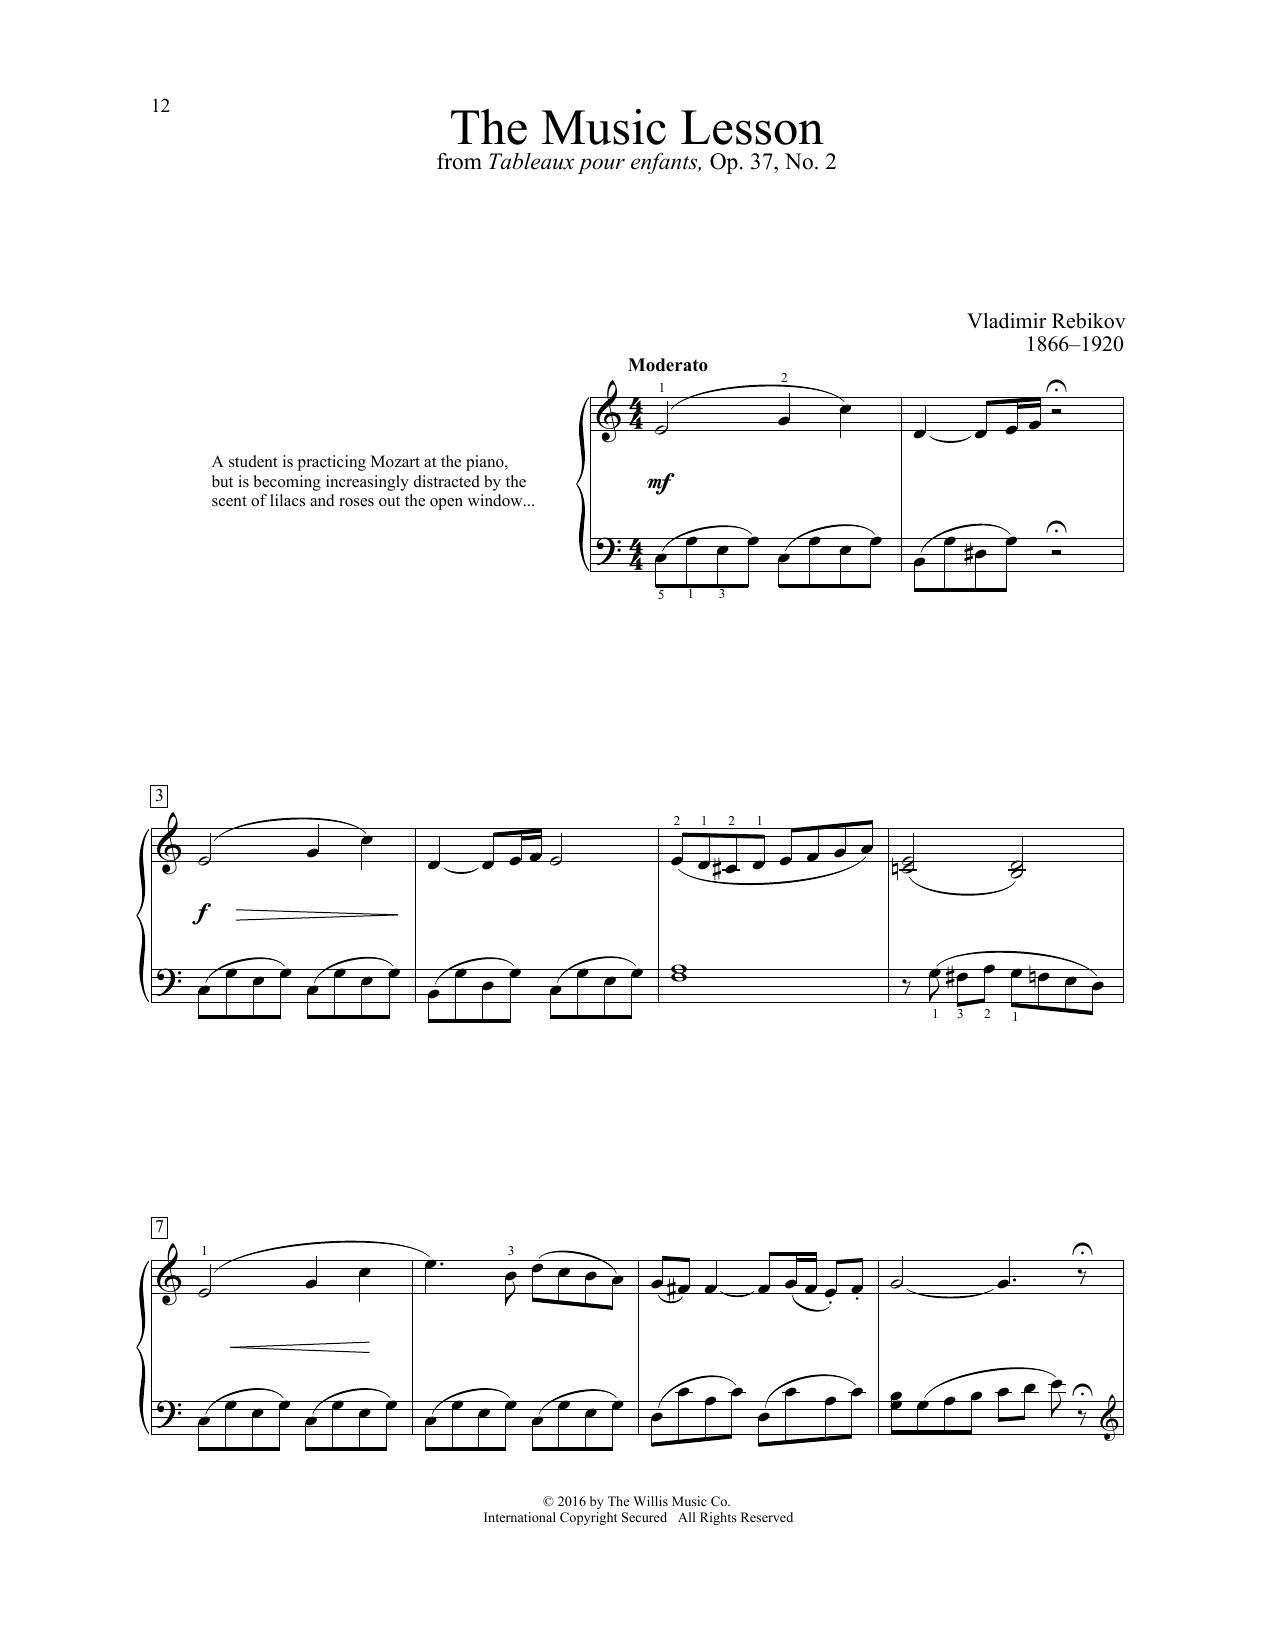 Vladimir Rebikov The Music Lesson sheet music notes and chords. Download Printable PDF.